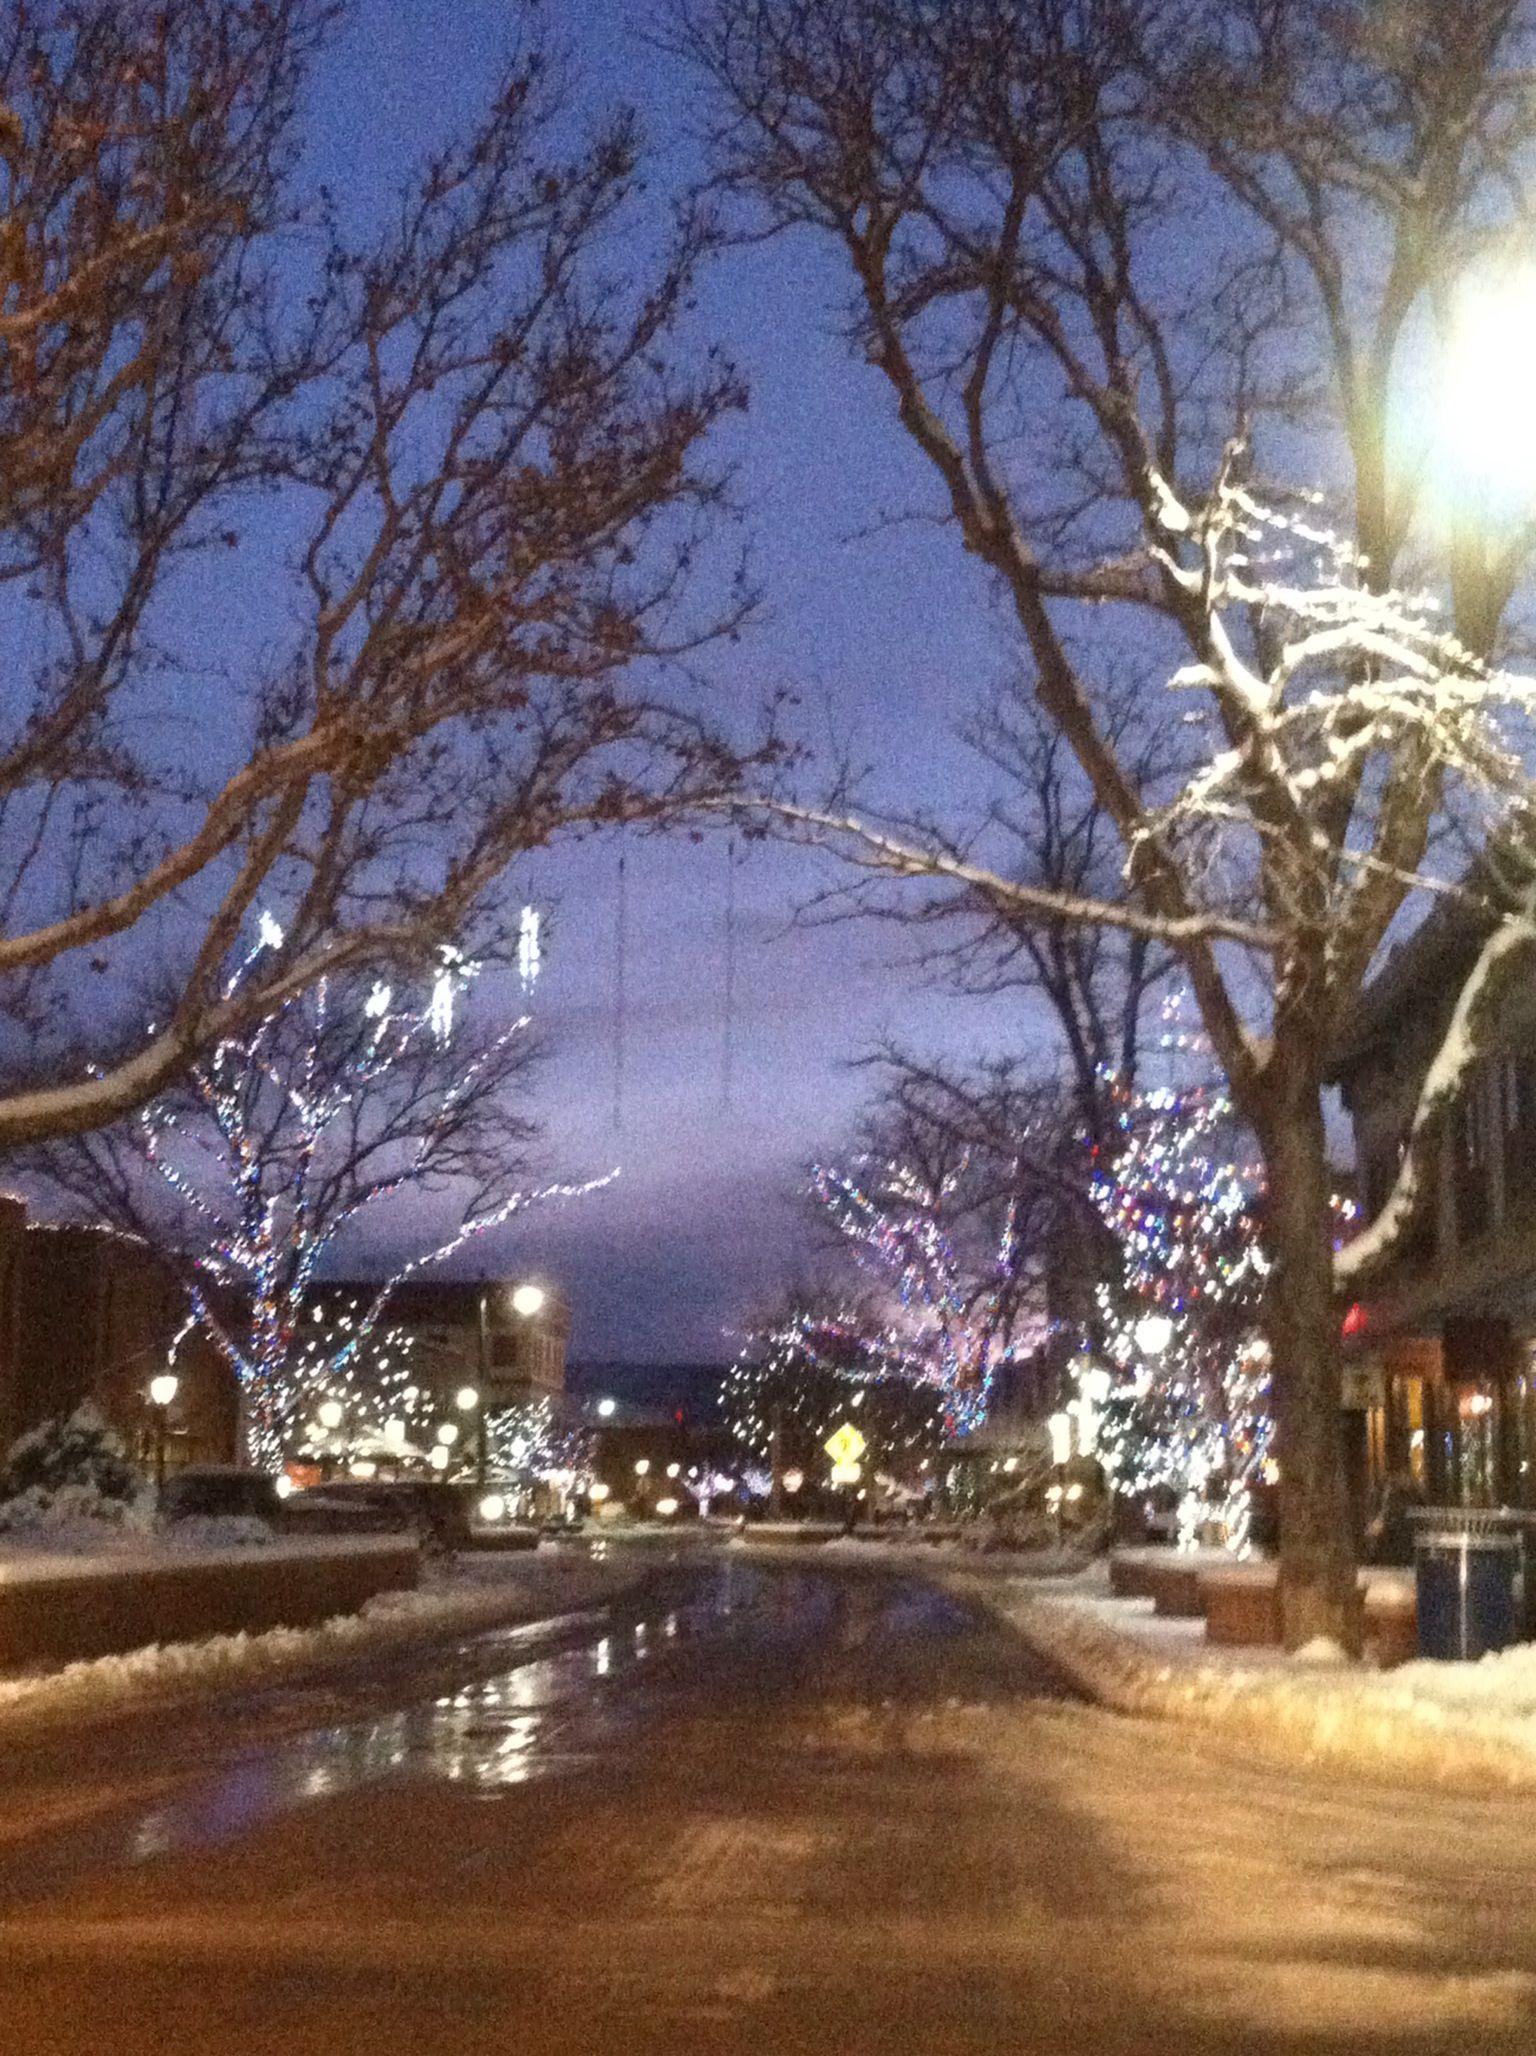 Grand Junction Christmas Lights 2019 Holiday lights in downtown Grand Junction. | Grand Junction in